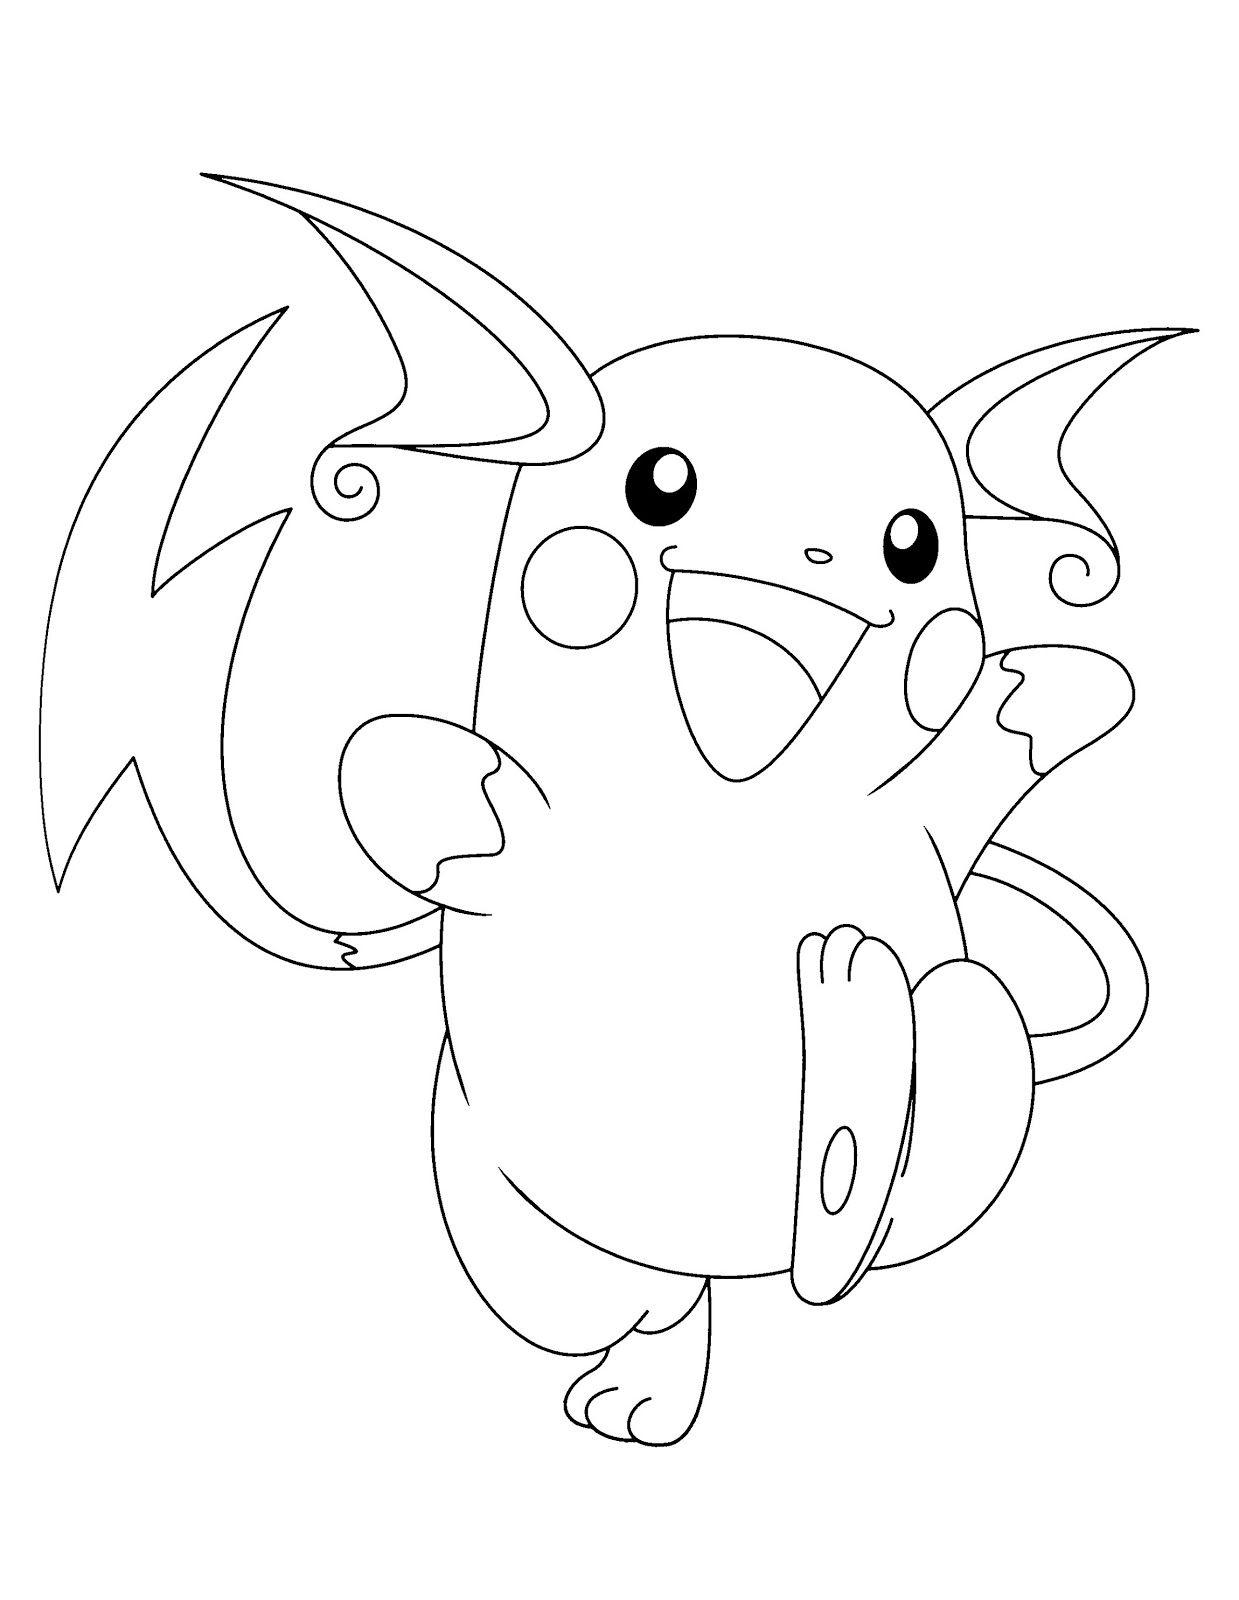 Free Printable Raichu Pokemon Go Coloring Pages To Kids In 2021 Pokemon Coloring Pages Pokemon Coloring Pokemon Coloring Sheets [ 1600 x 1239 Pixel ]